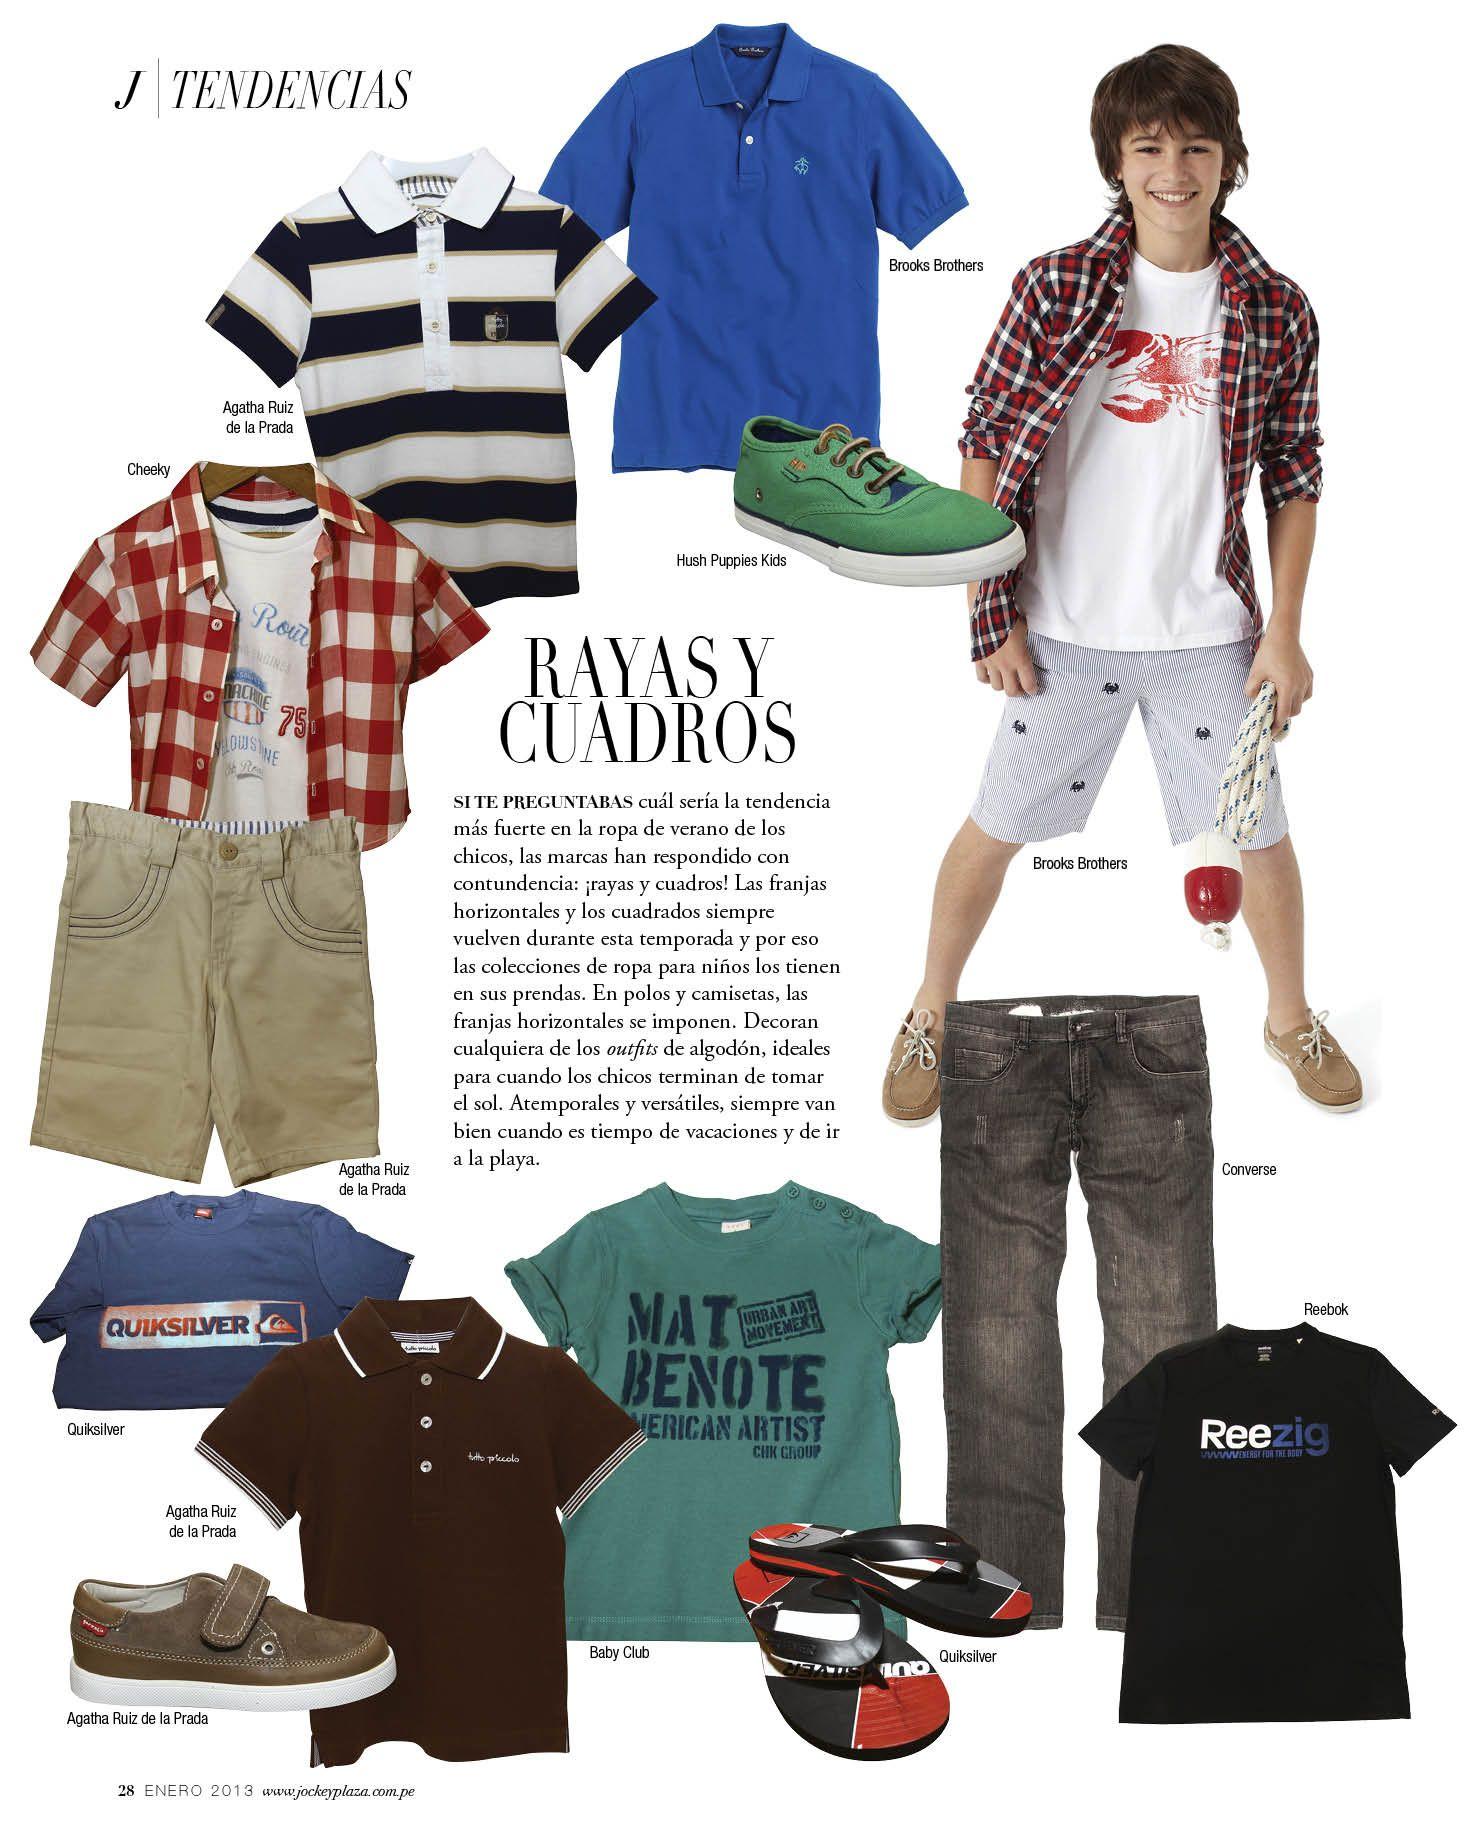 Rayas y Cuadros - Revista J #kids  #summer  #loveit #fashionnews #fashiontips #shopping